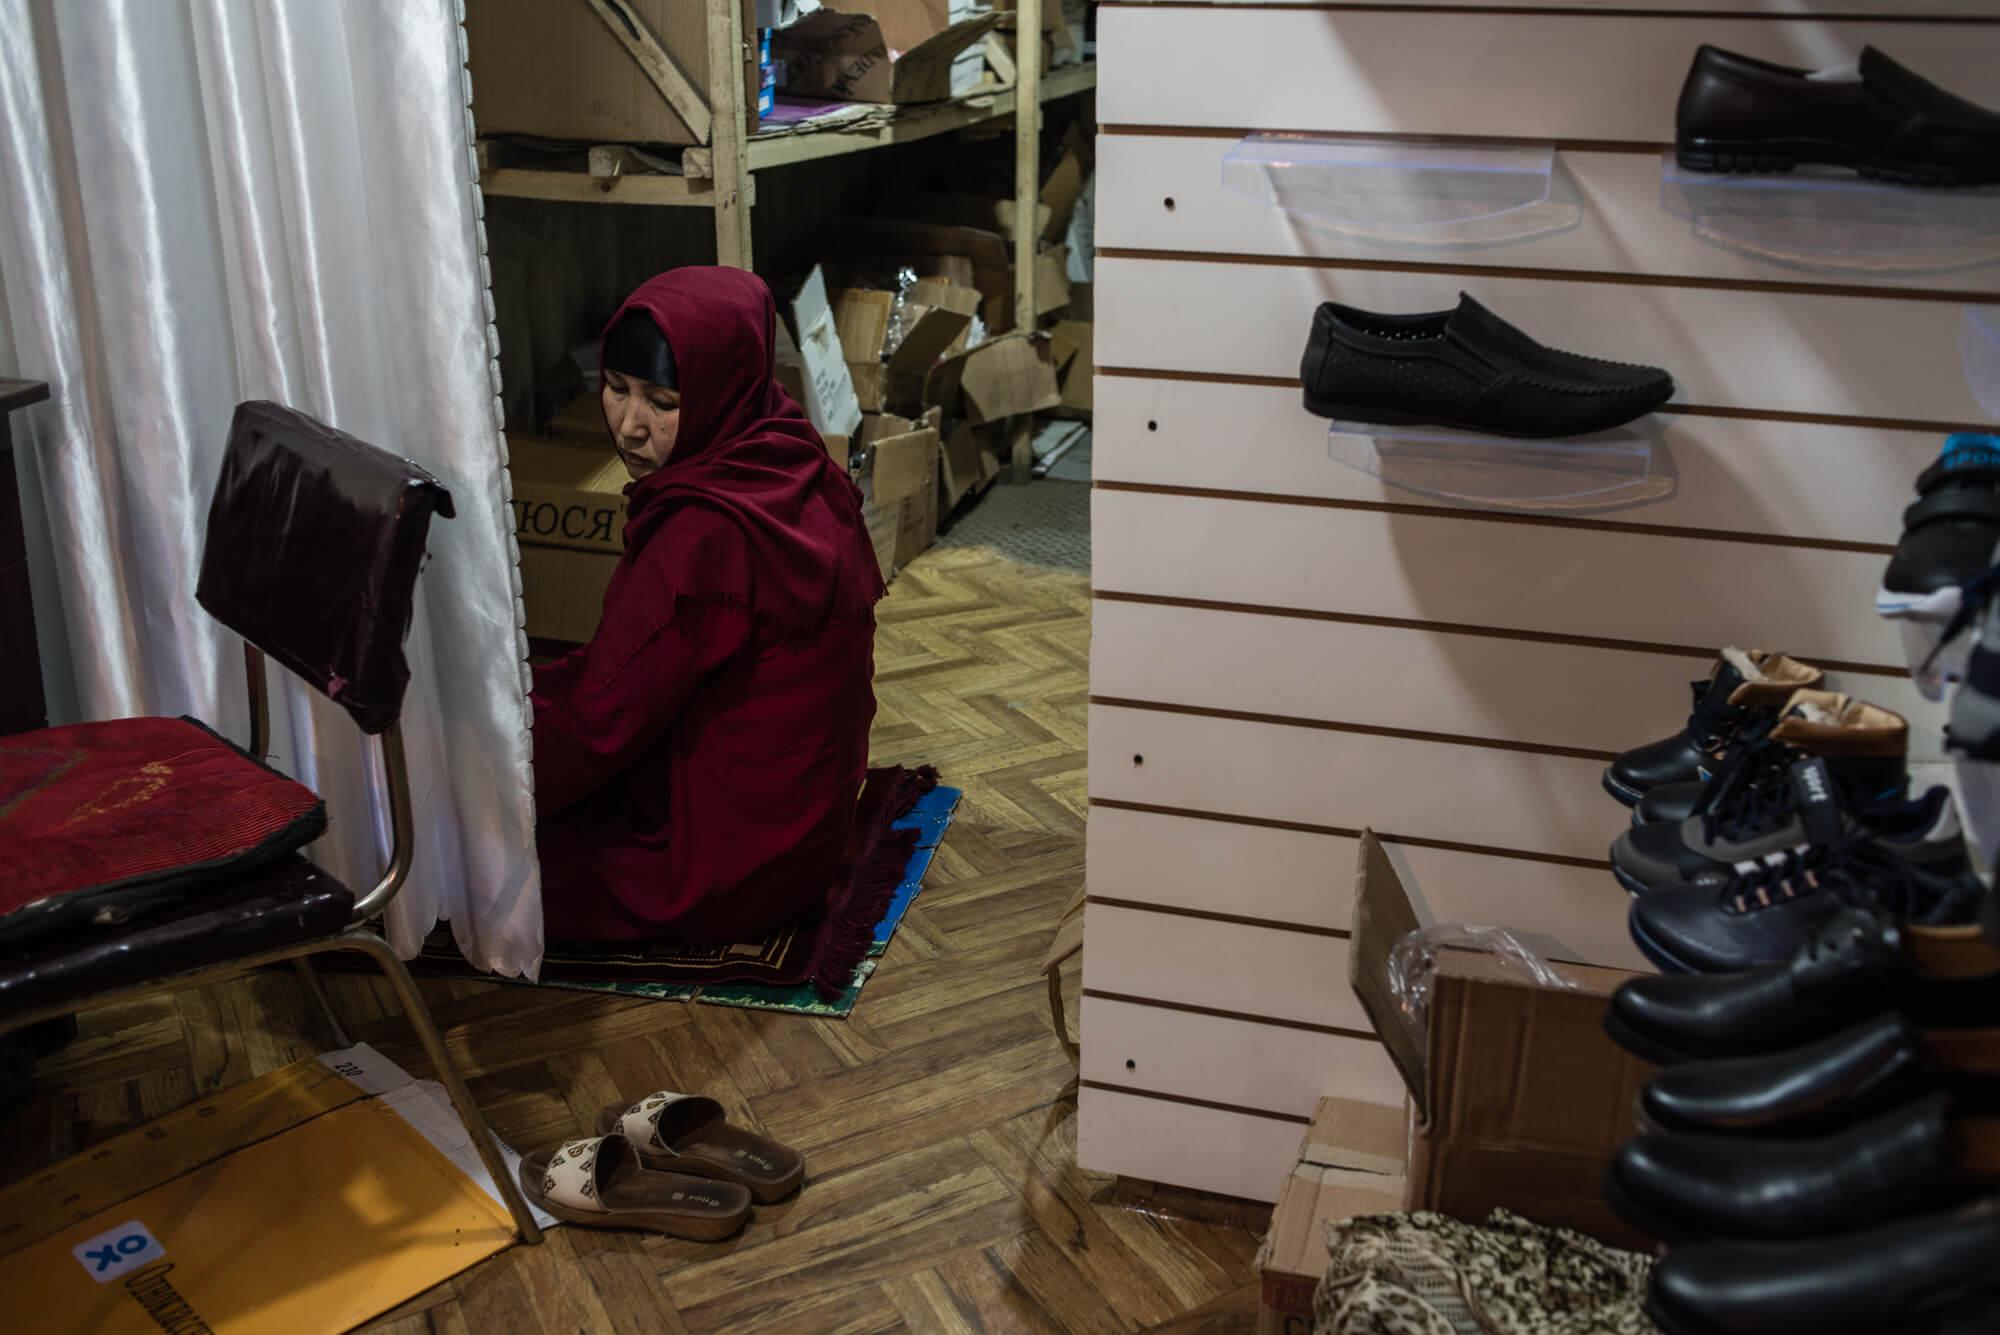 Kara-Soo Osch Kirgistan Gebet Islam